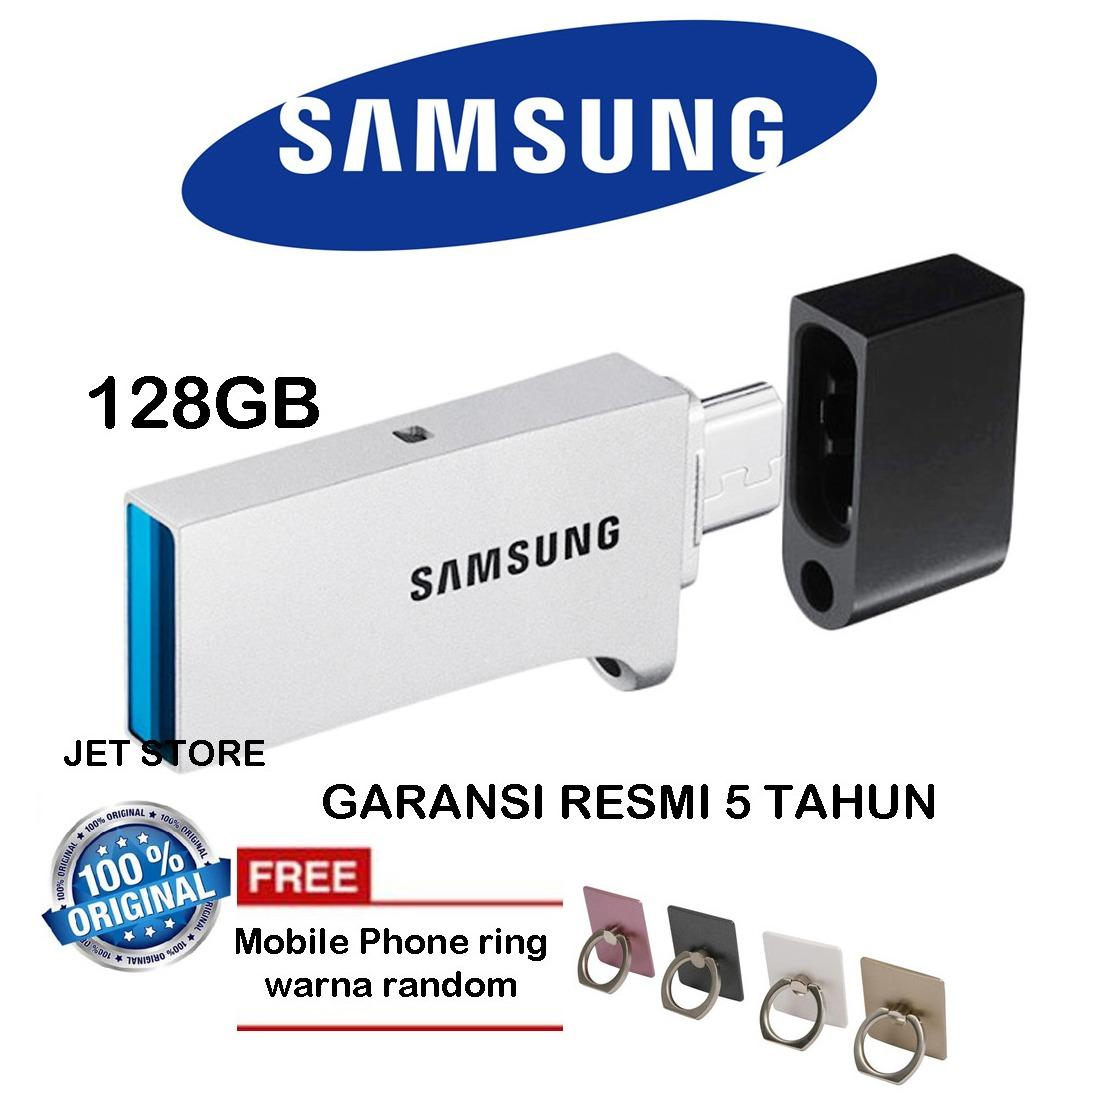 Jual Samsung Flashdisk Otg Usb 3 128Gb Duo Drive Iring Mobile Phone Branded Murah